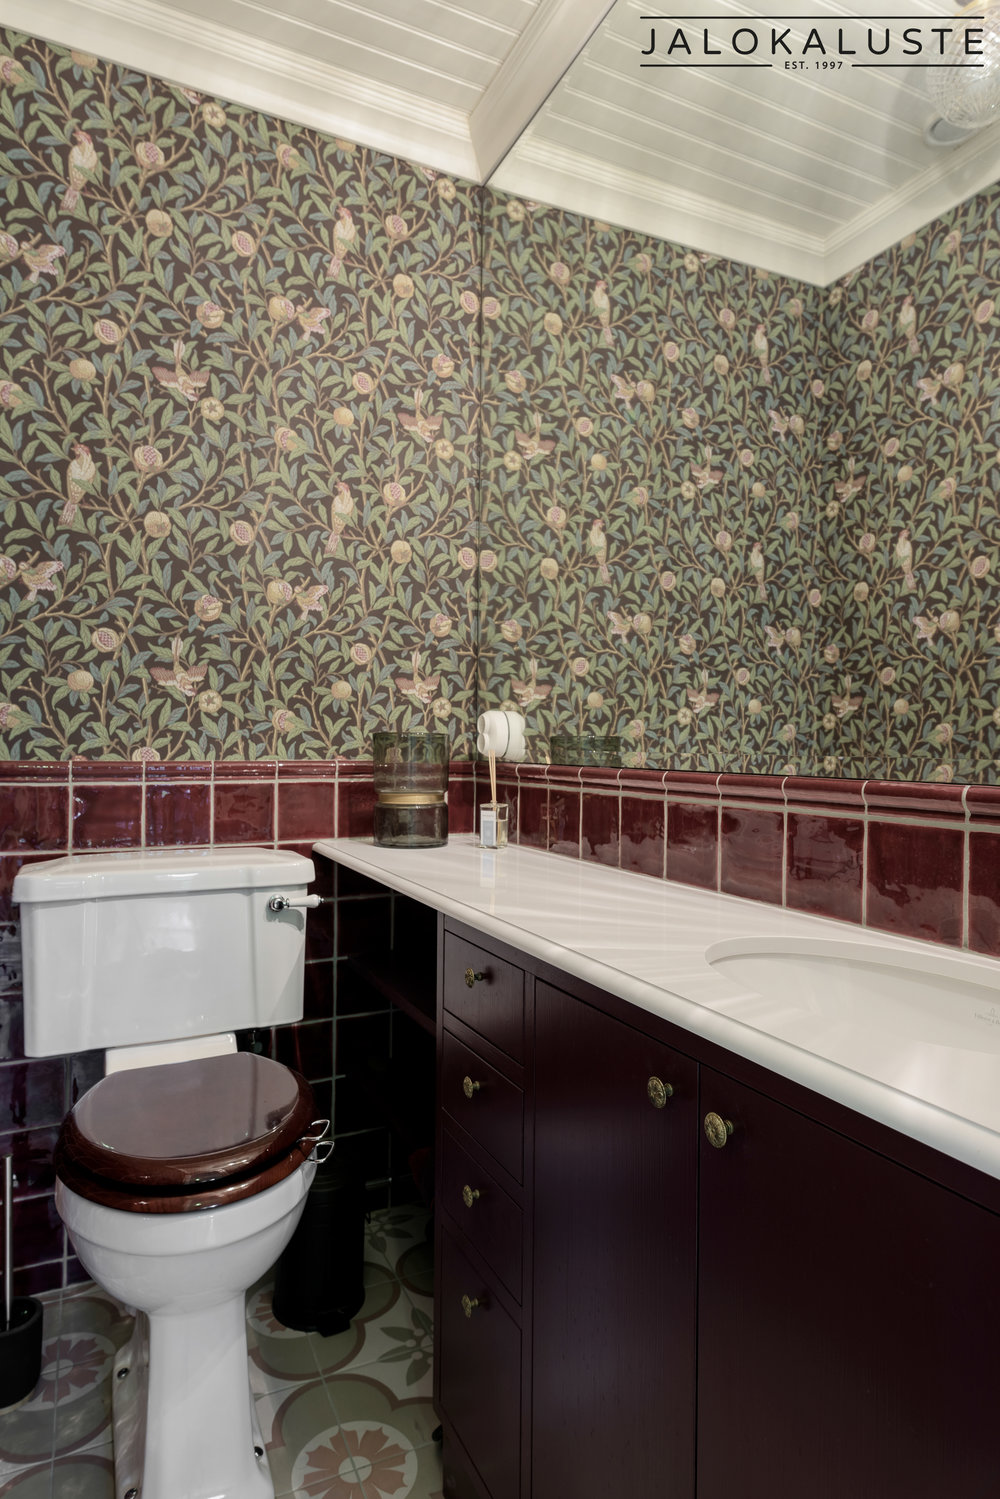 Jalokaluste wc-vanhanajan1.jpg